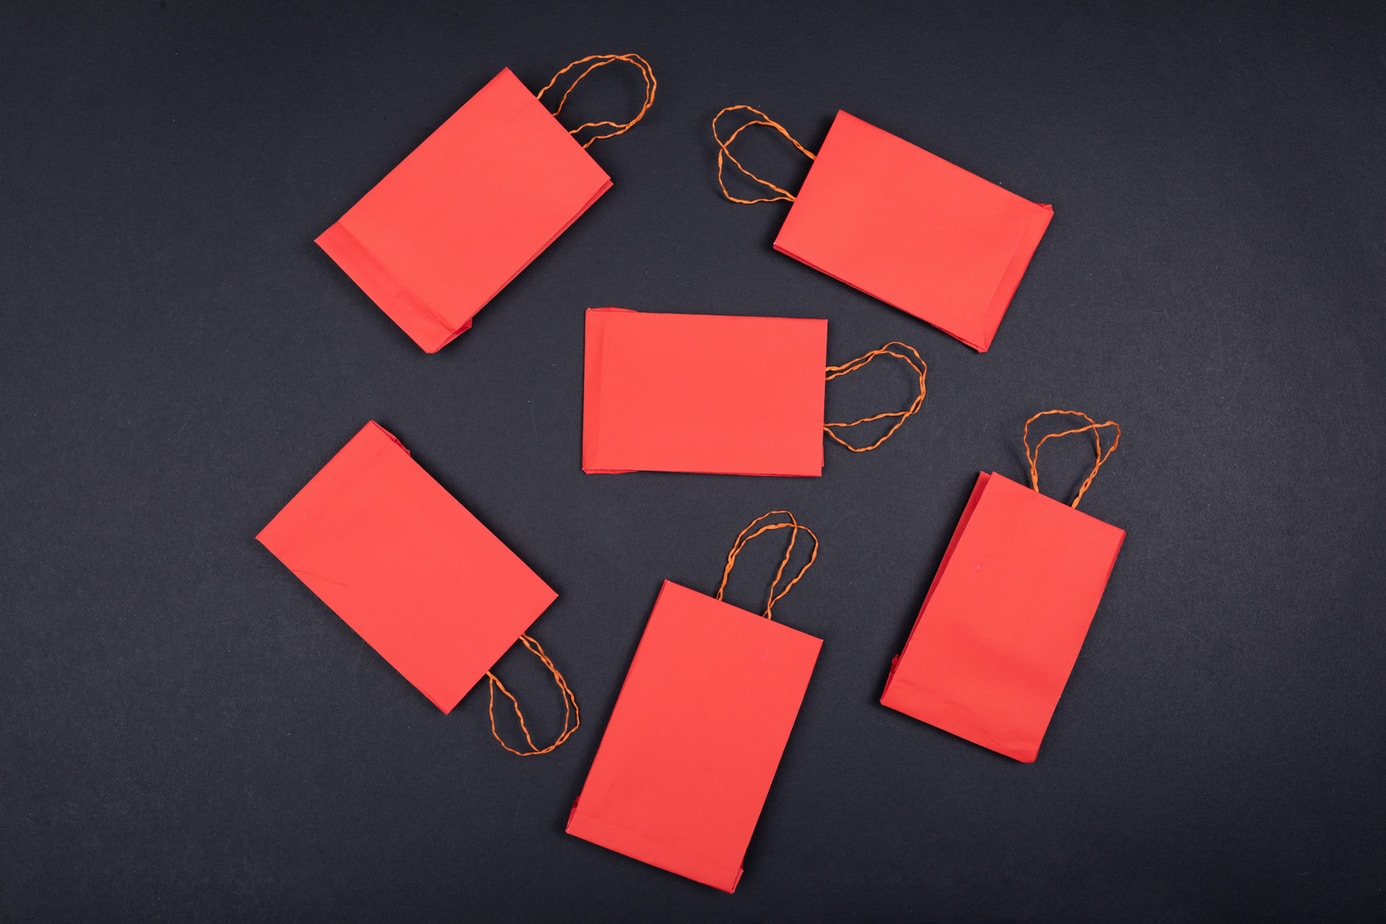 orange paper clip on black surface